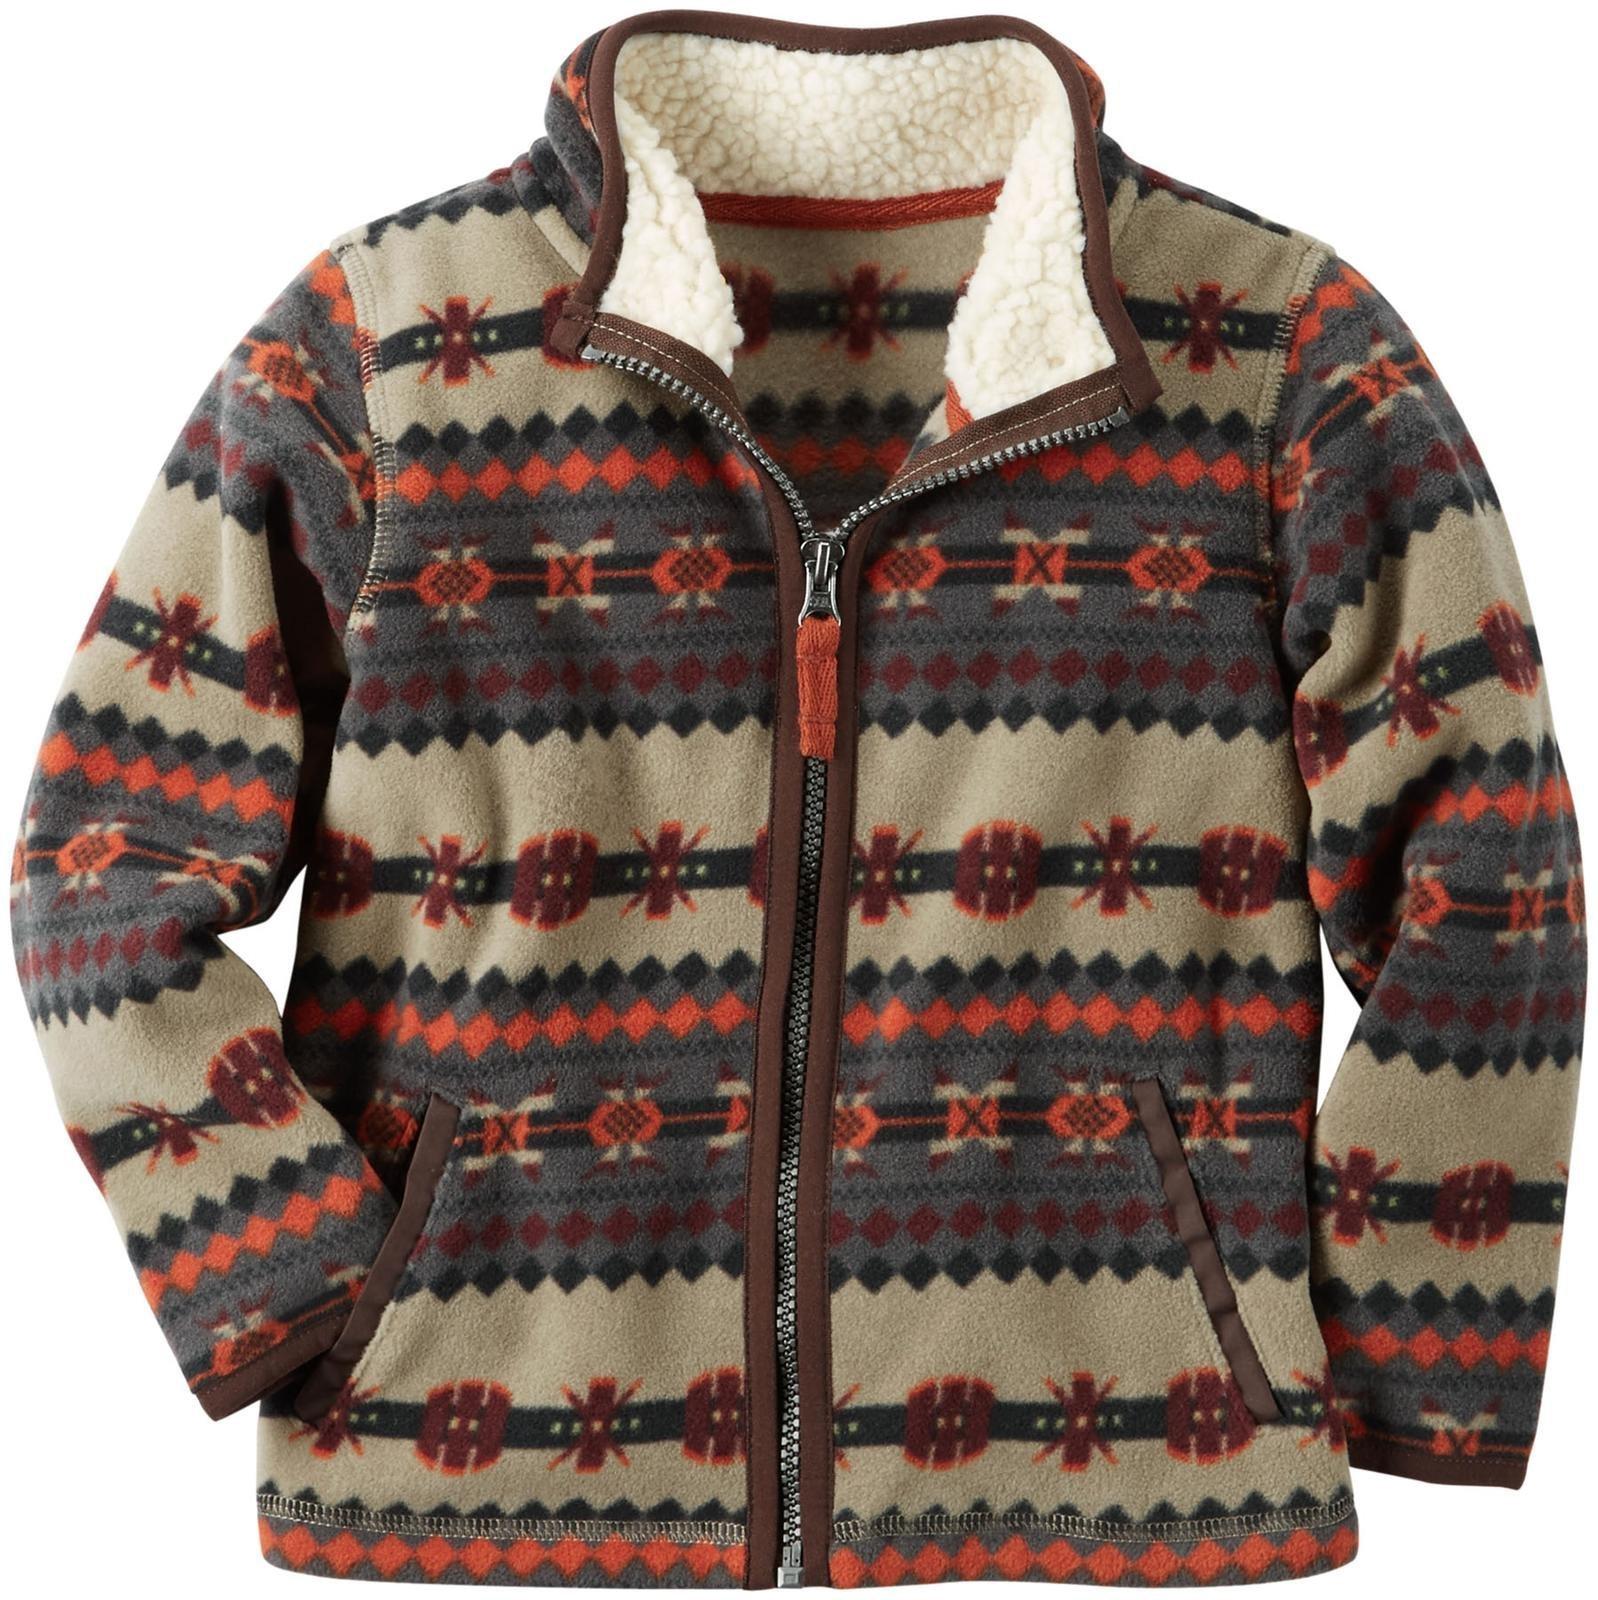 Carter's Boys' Knit Layering 263g629, Patterned 8